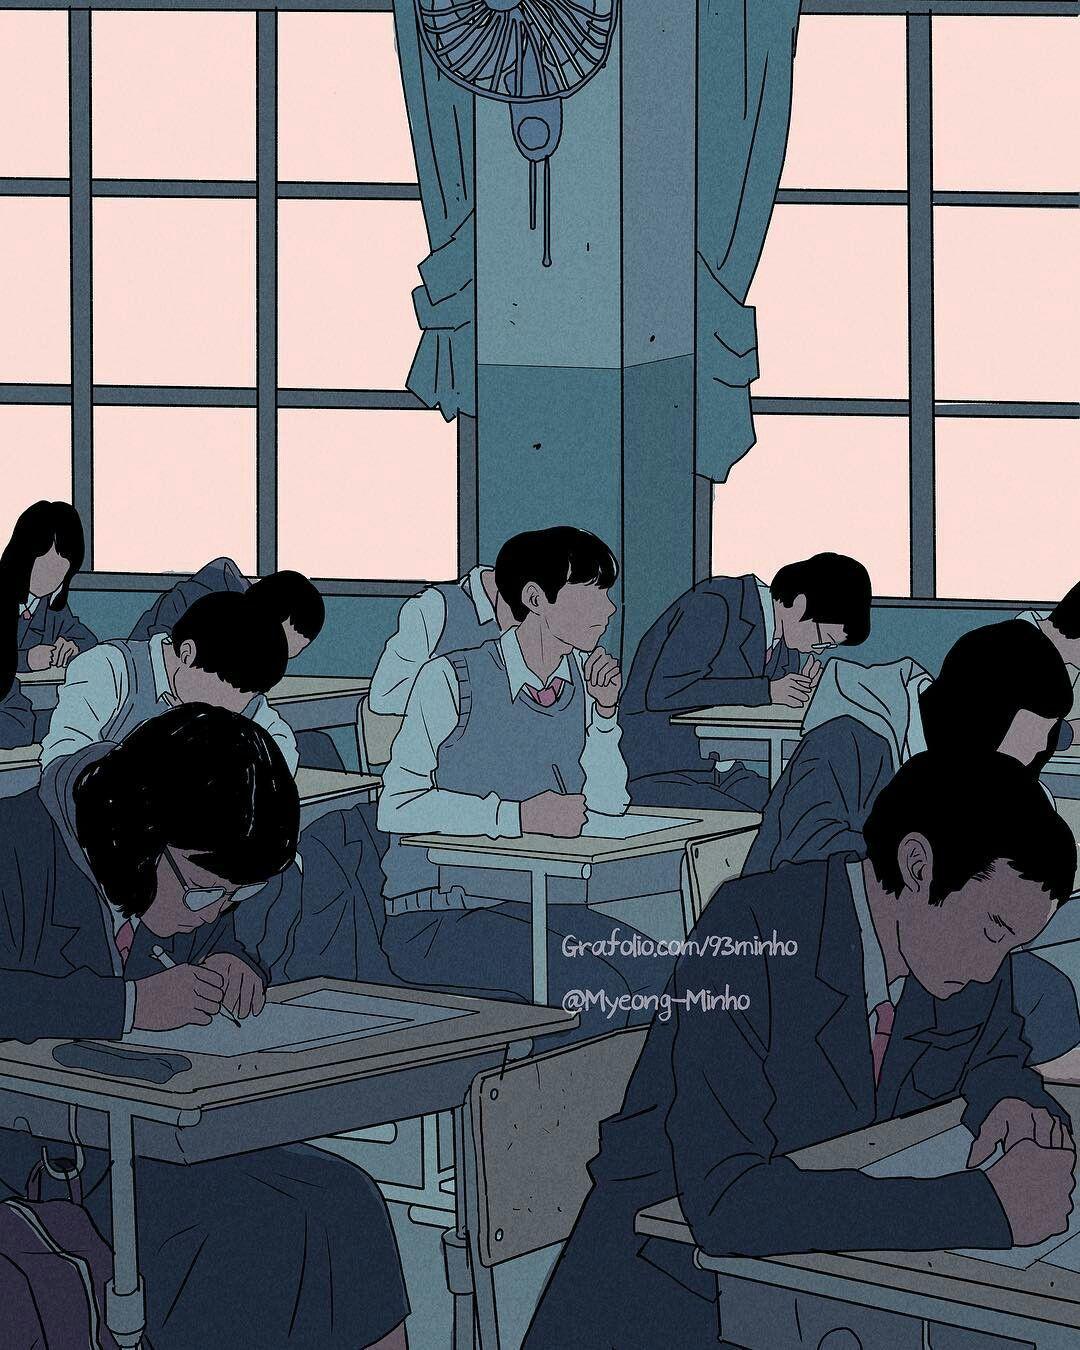 Pin By Himawari On 13 Art Aesthetic Anime Illustration Art